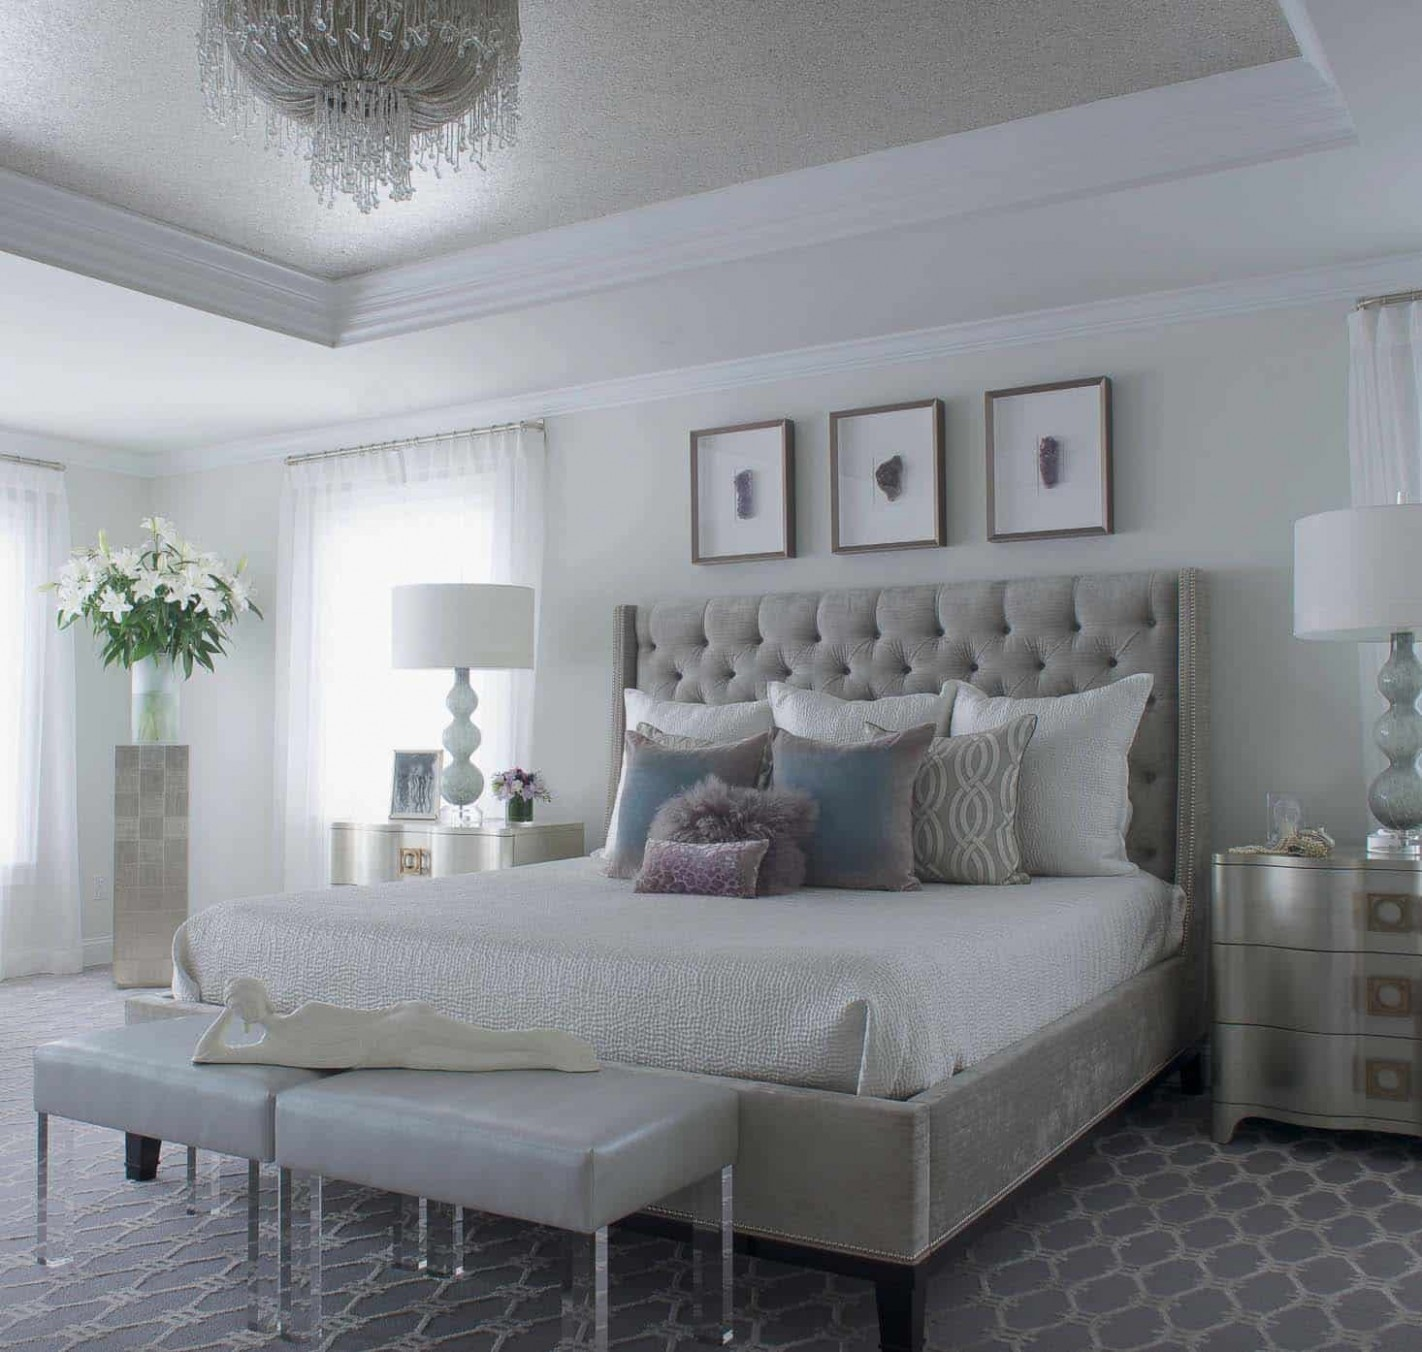 12+ Serene And Elegant Master Bedroom Decorating Ideas - Wall Decor Ideas Master Bedroom